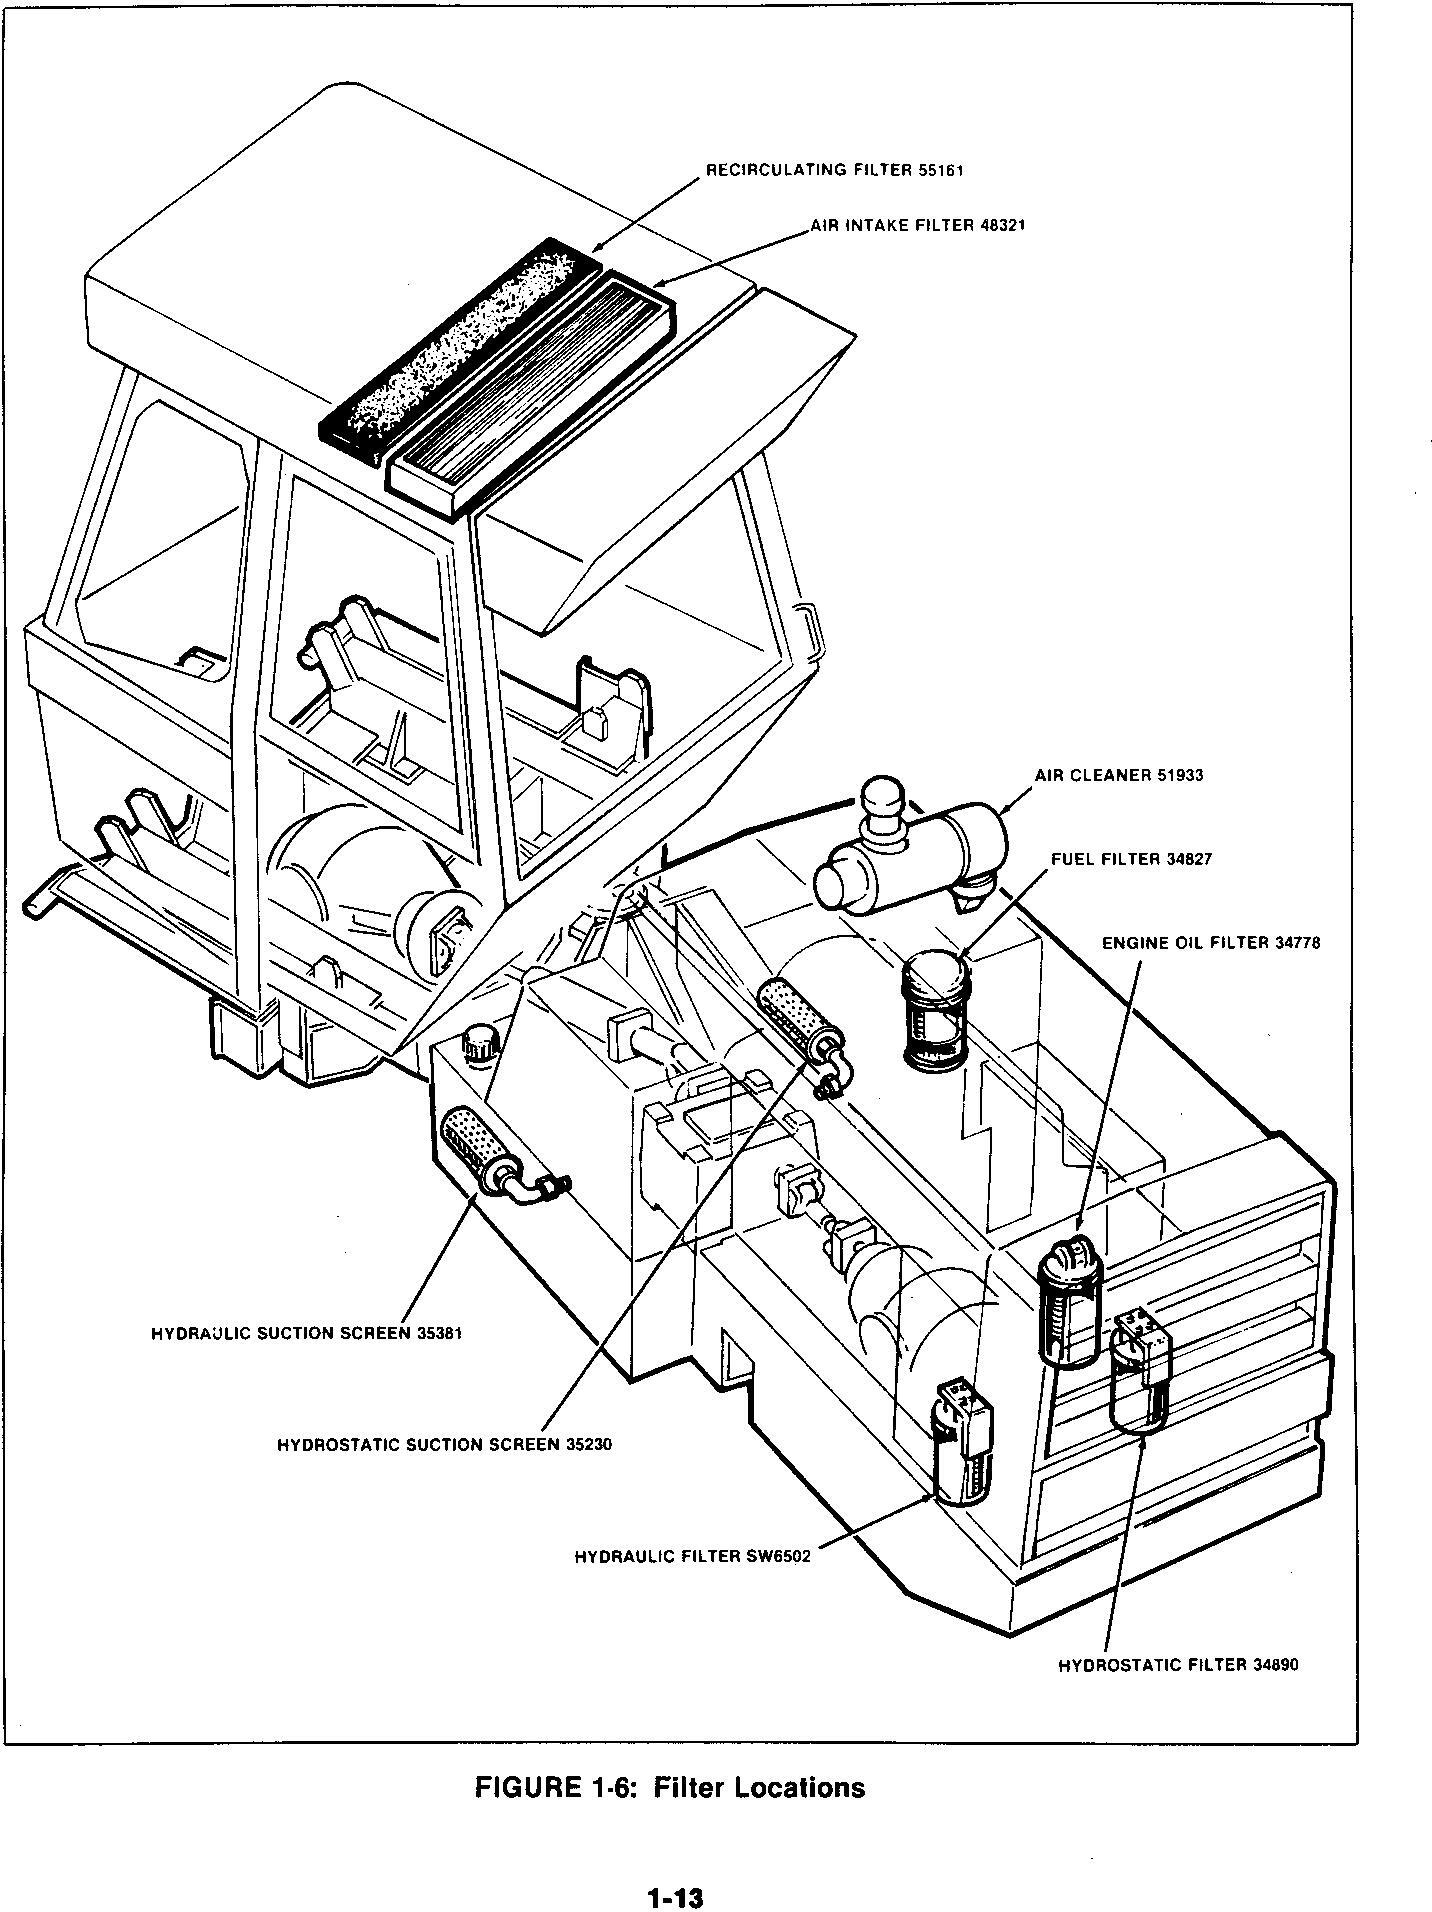 New Holland Versatile 150, 160 4WD Tractors (1977-1983) Service Repair Manual - 3